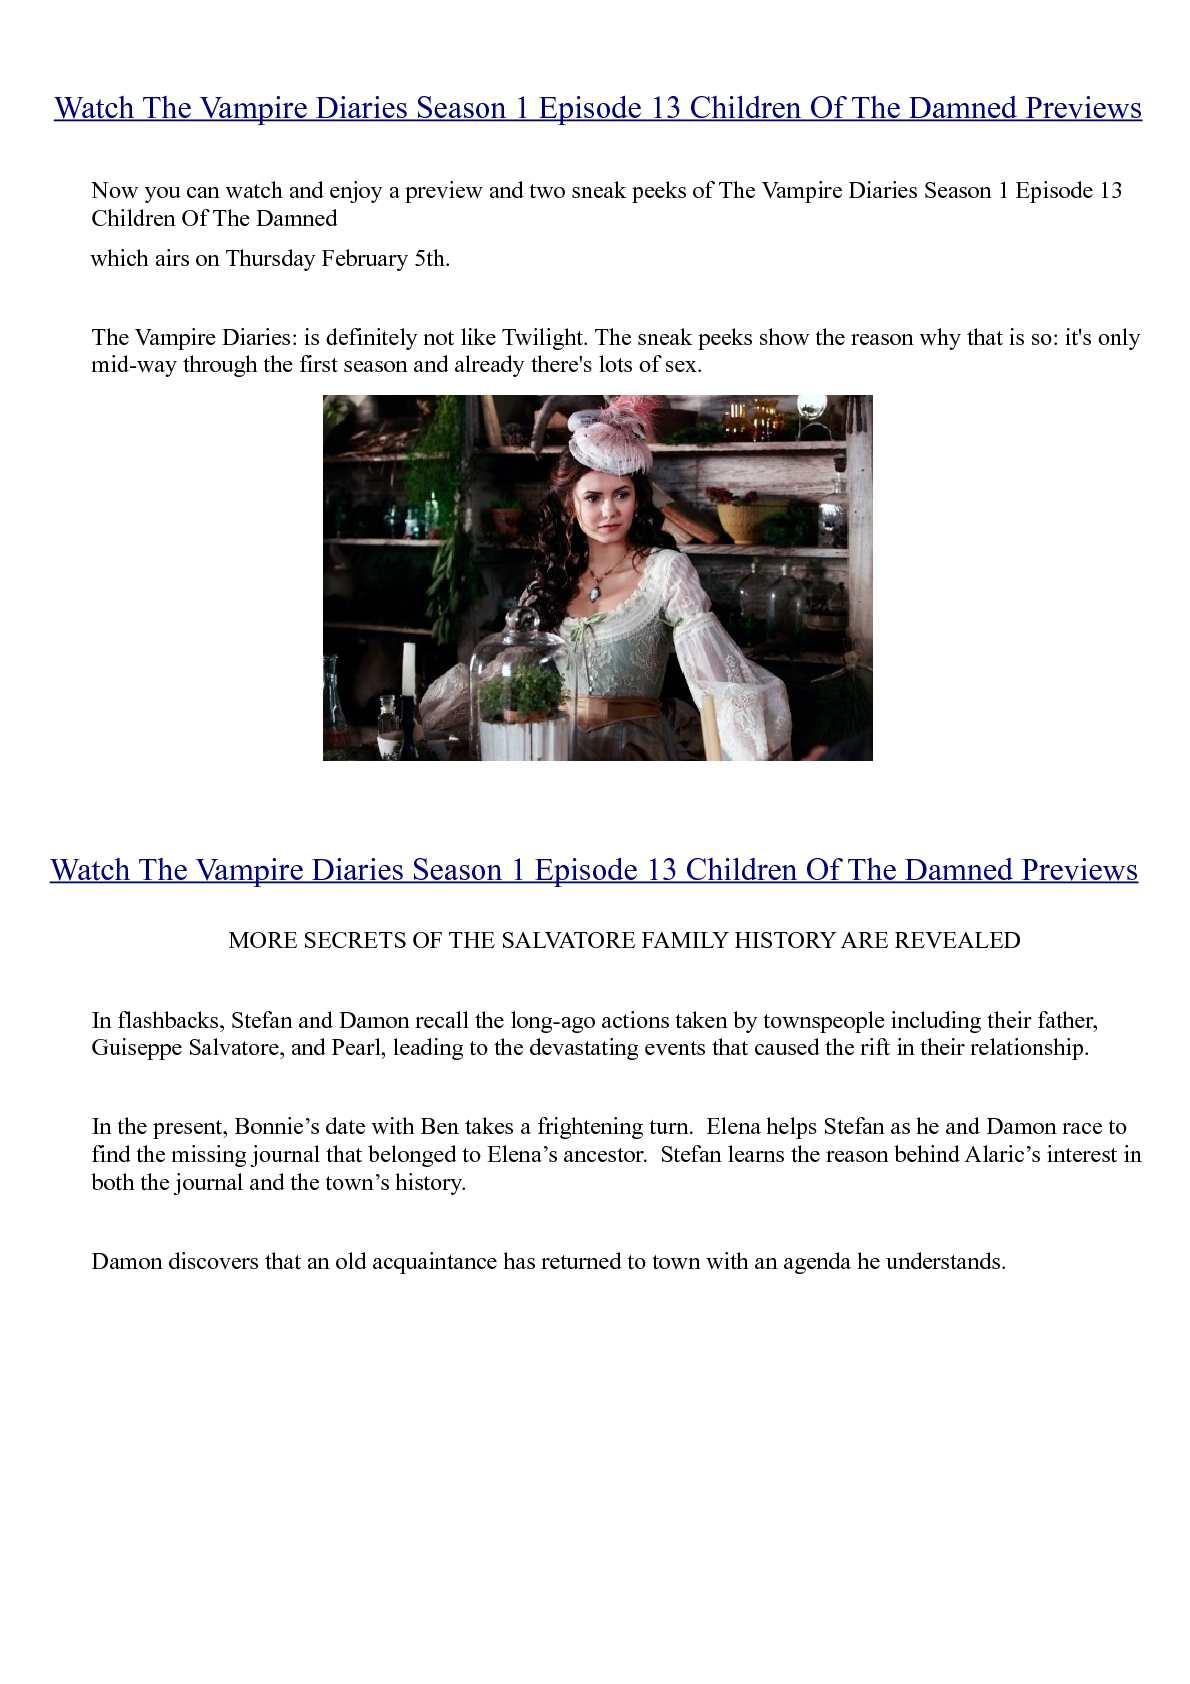 Calaméo - Watch The Vampire Diaries Season 1 Episode 13 Children Of